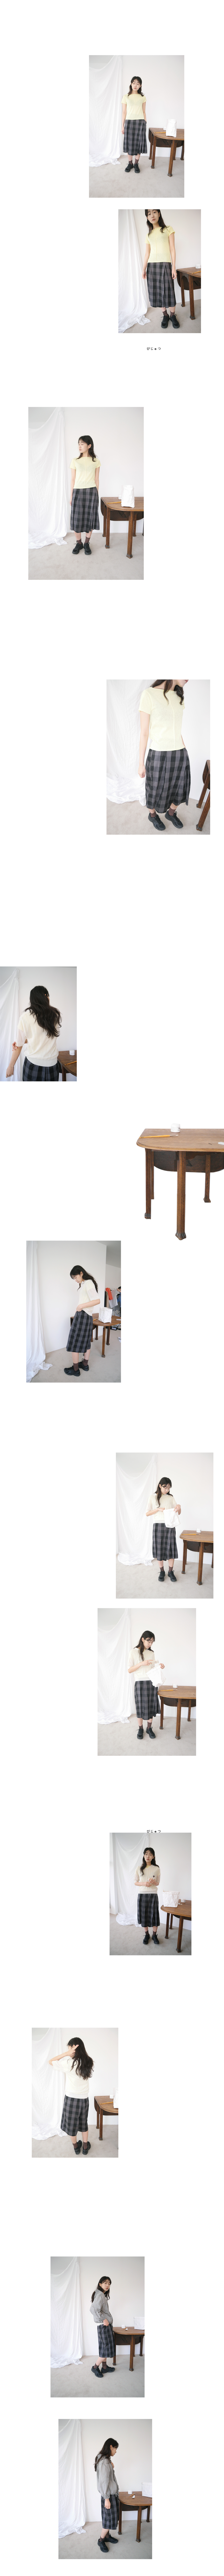 thin soft color socks